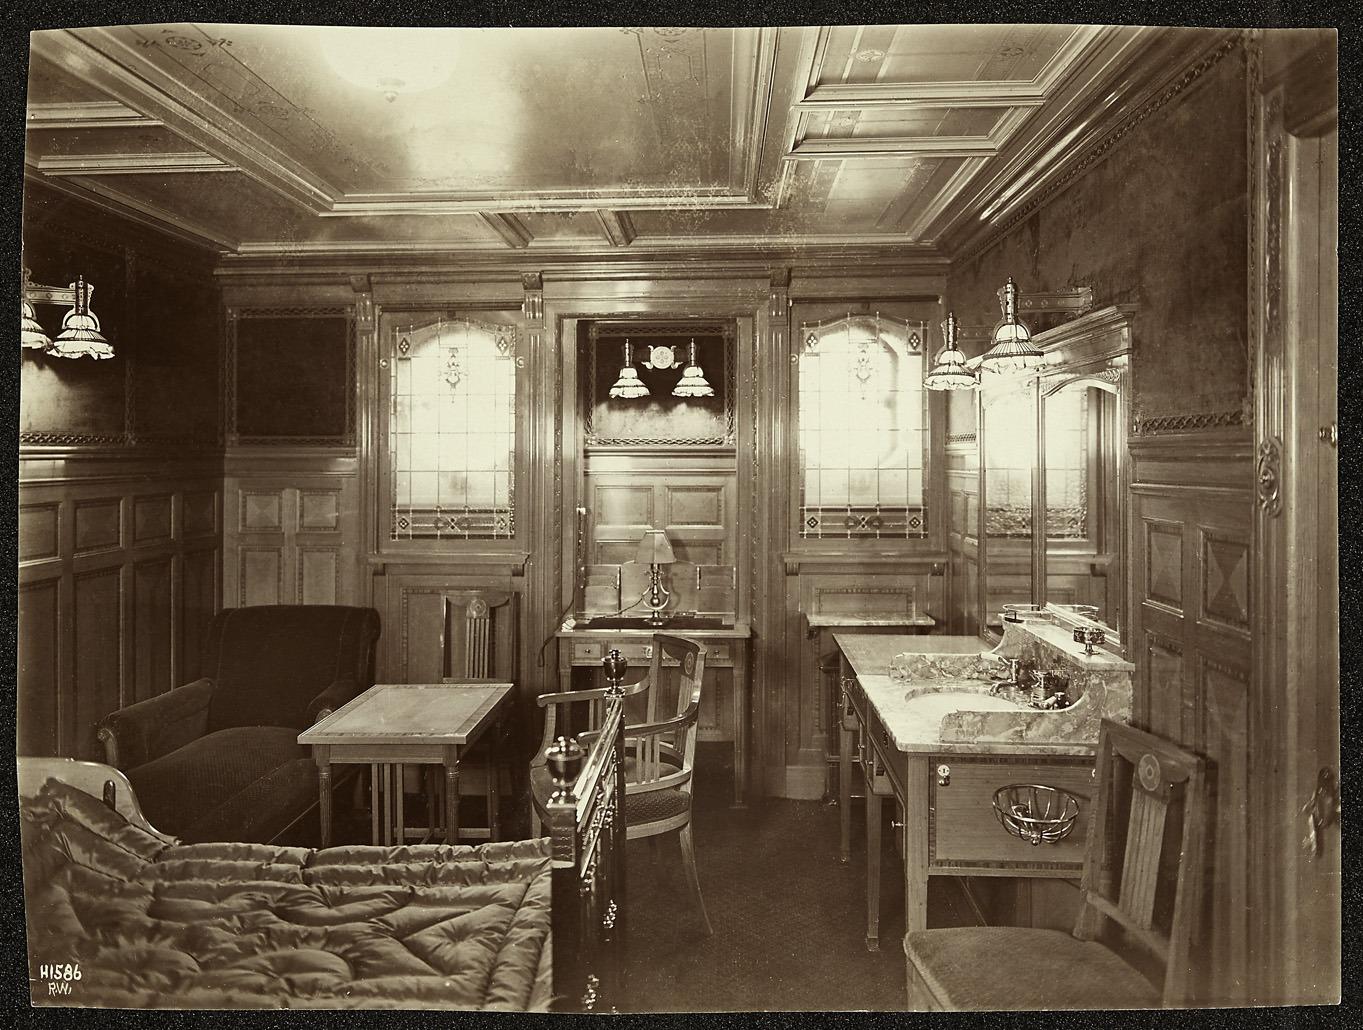 The interior of a cabin.